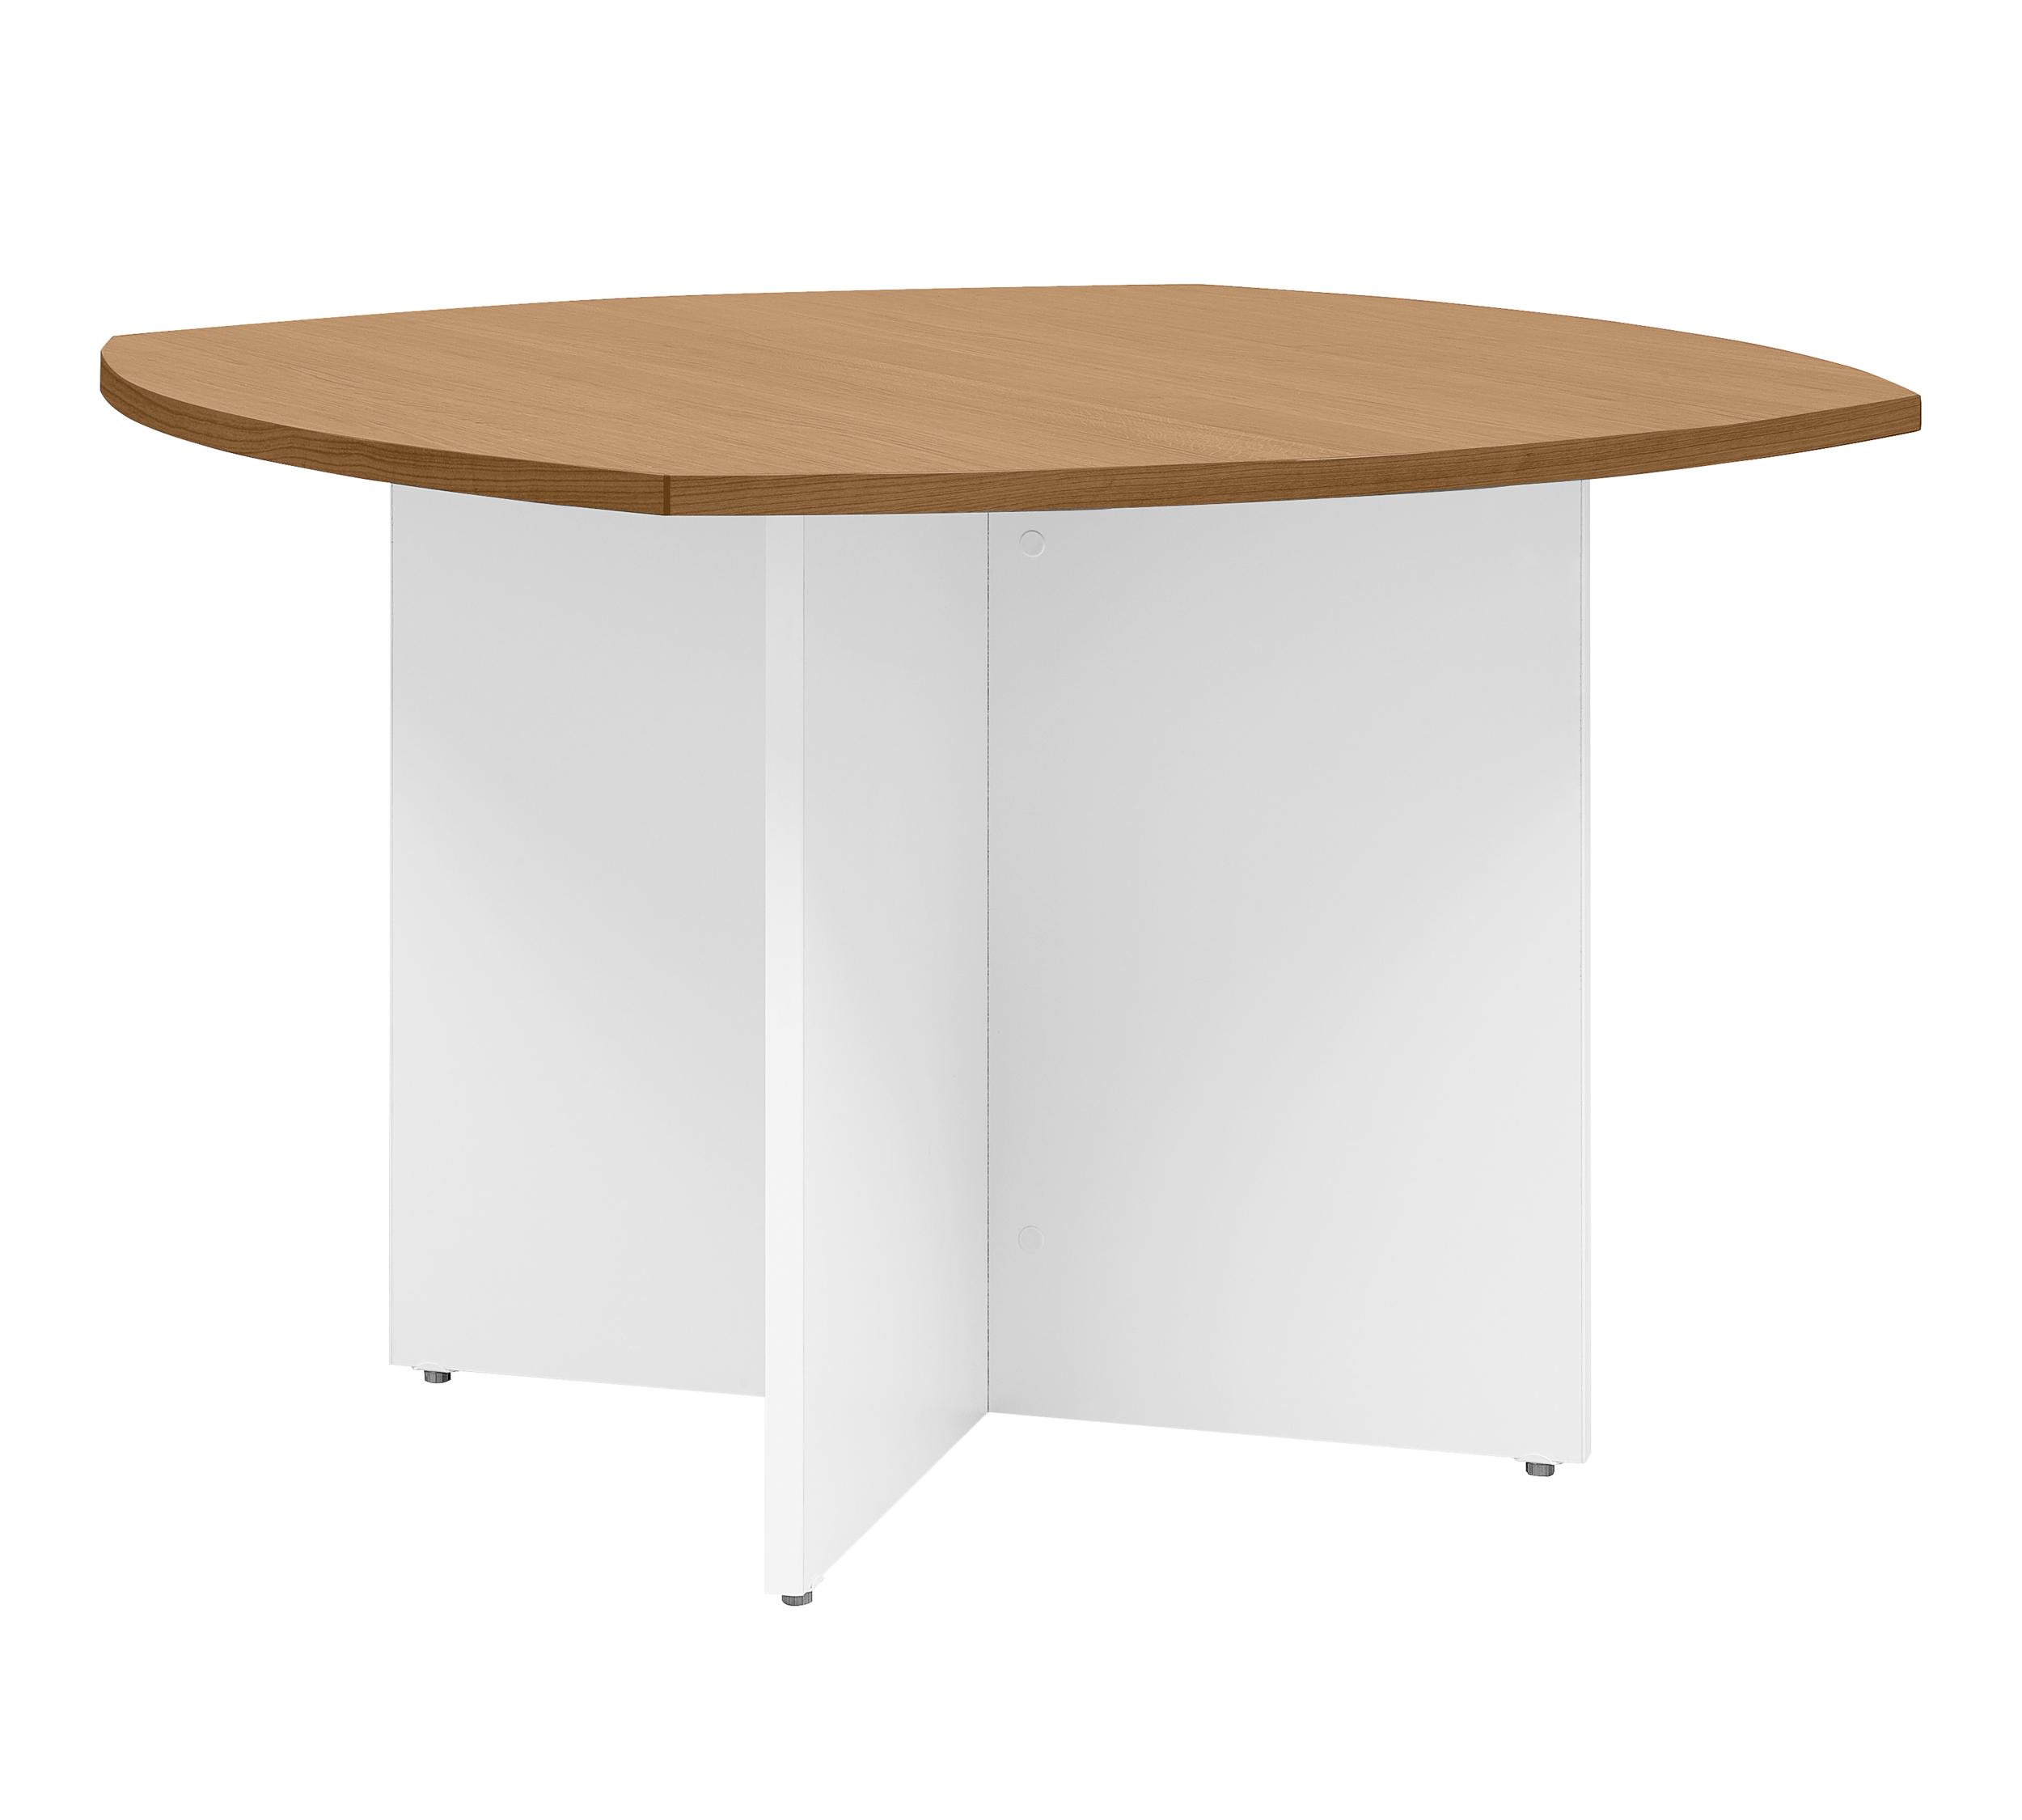 YES/XERUS MERISIER TABLE RONDE